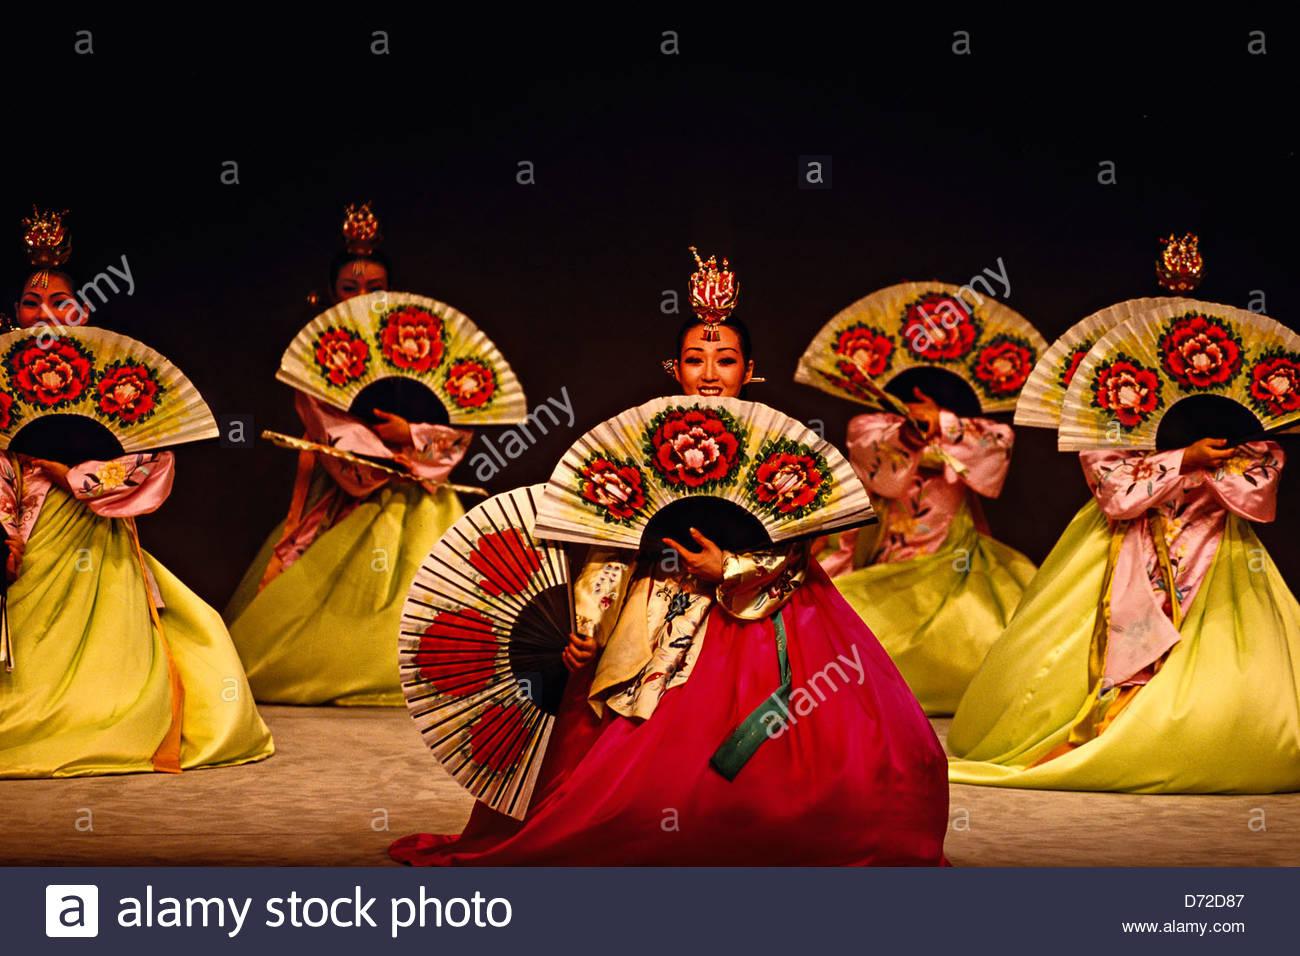 Korean traditional music and dance performance. Korea House. Seoul Stock Photo. Royalty Free Image: 55988023 - Alamy